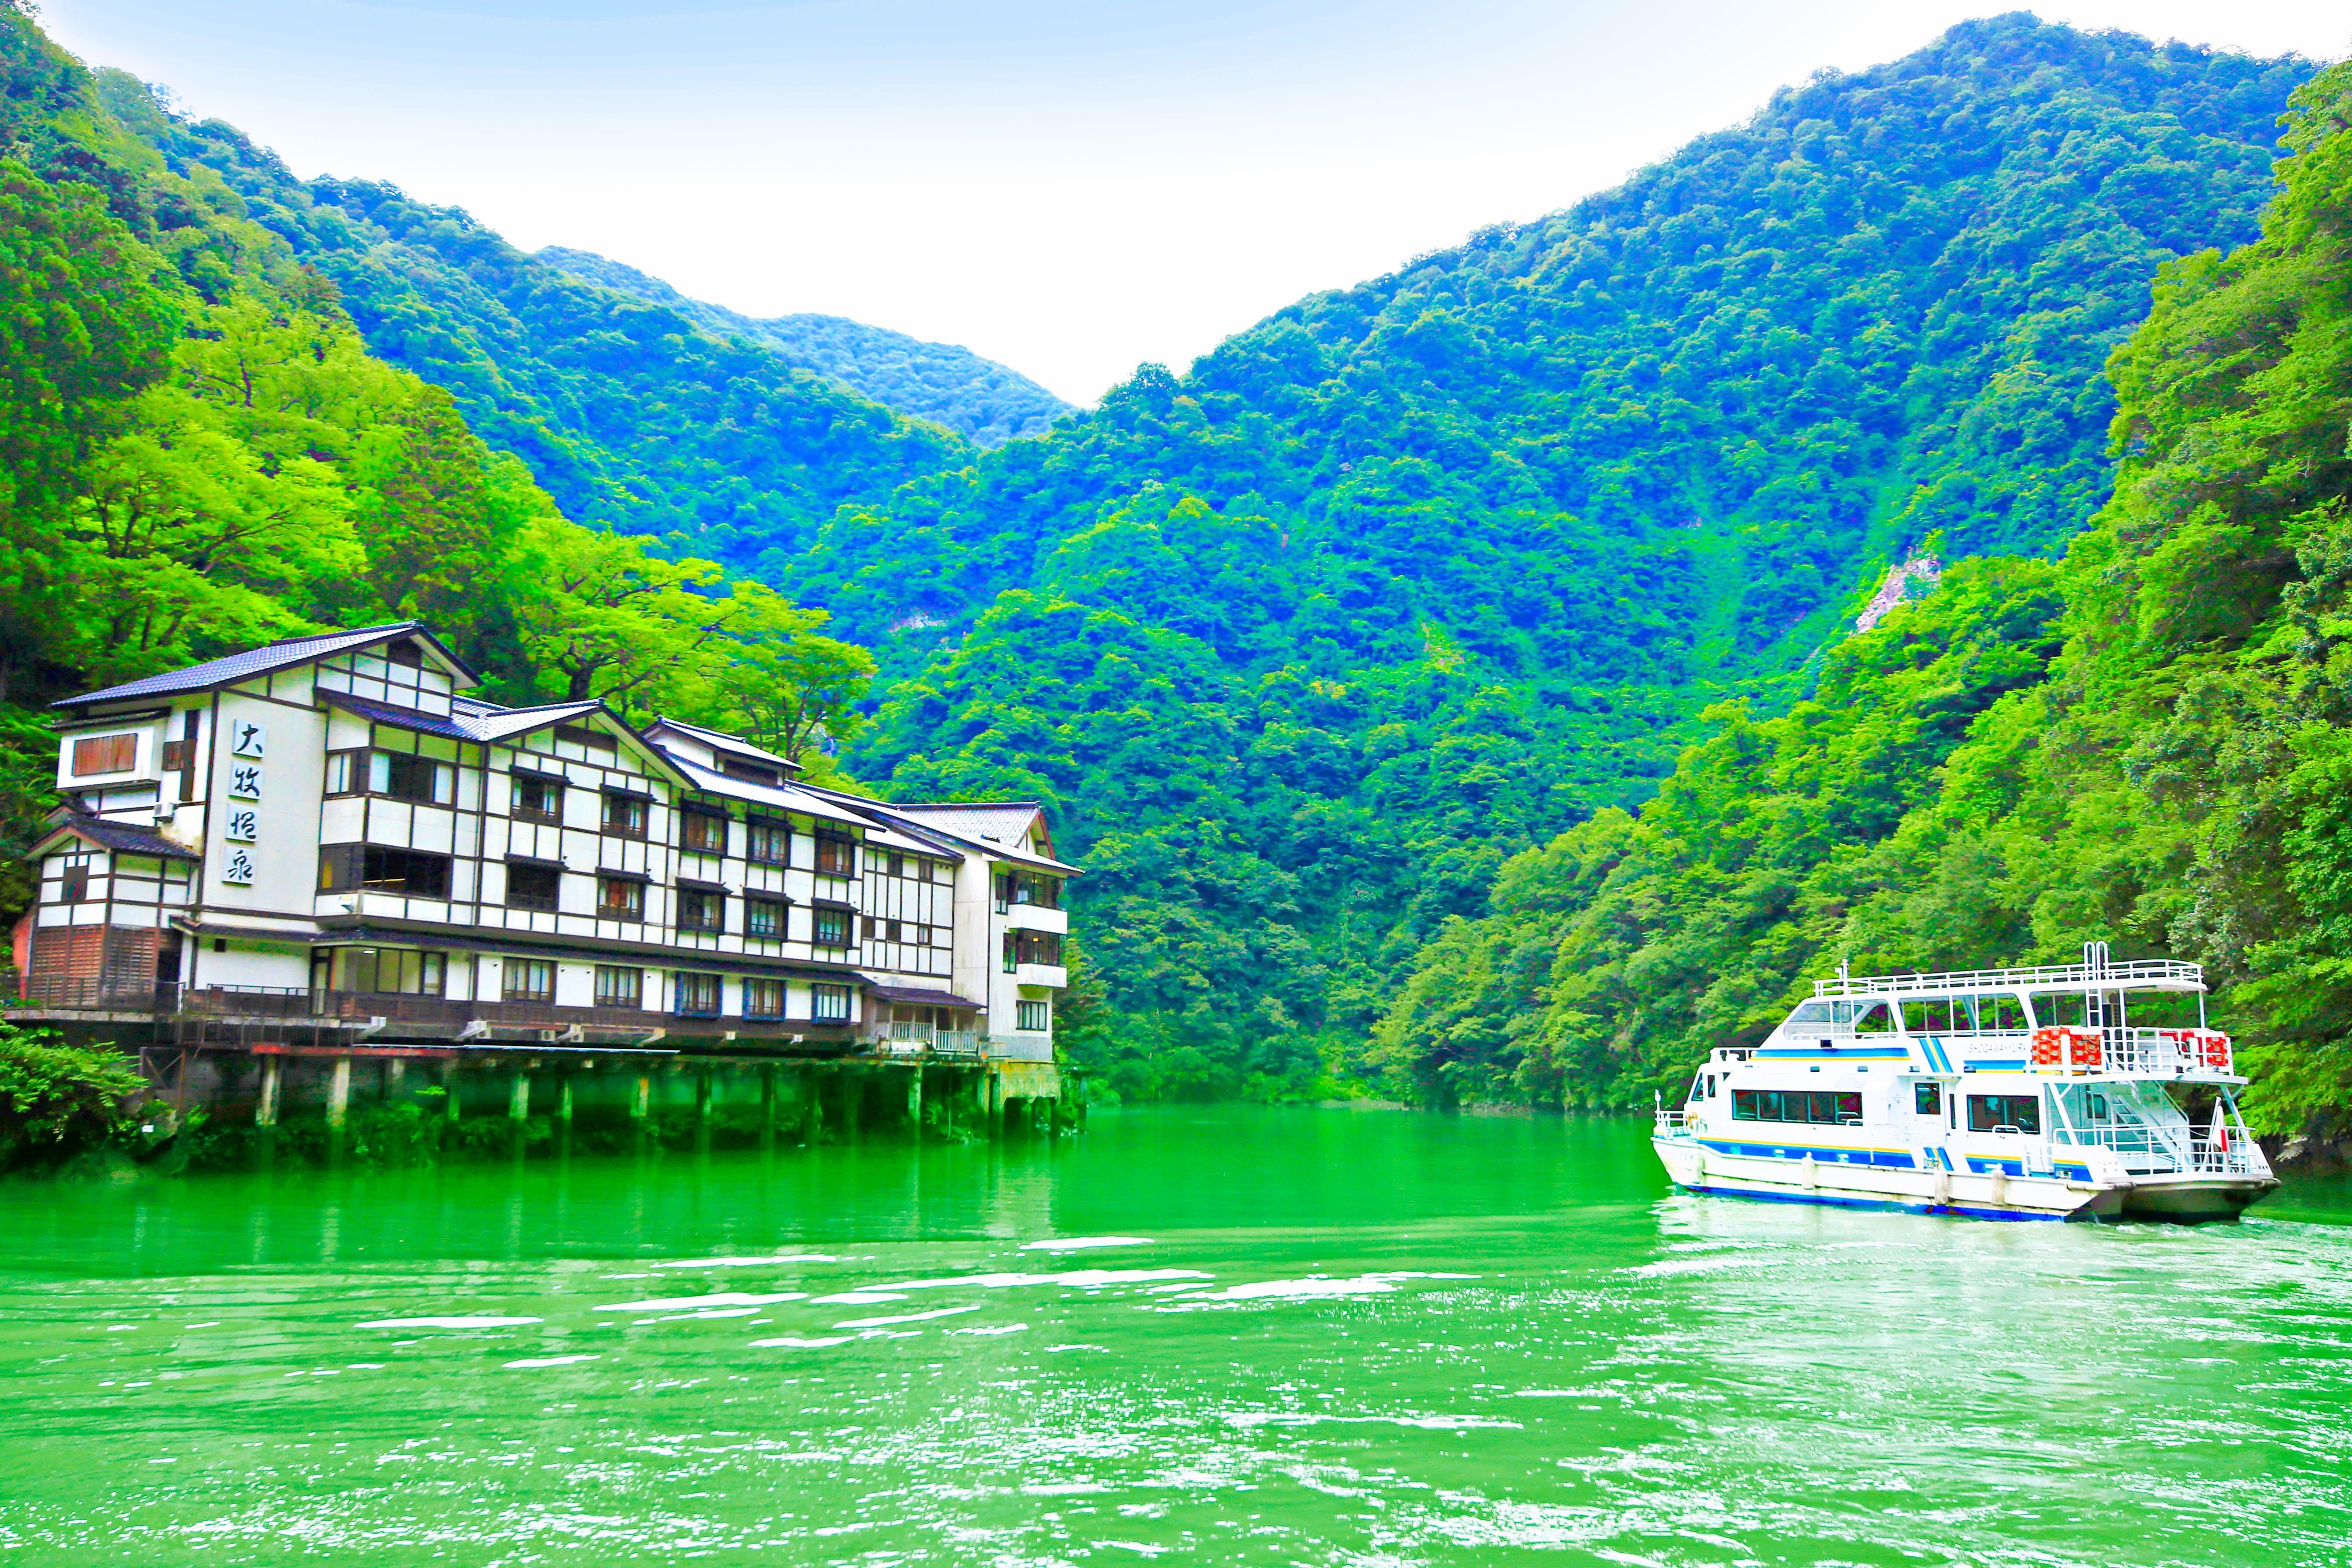 大牧温泉観光旅館 image